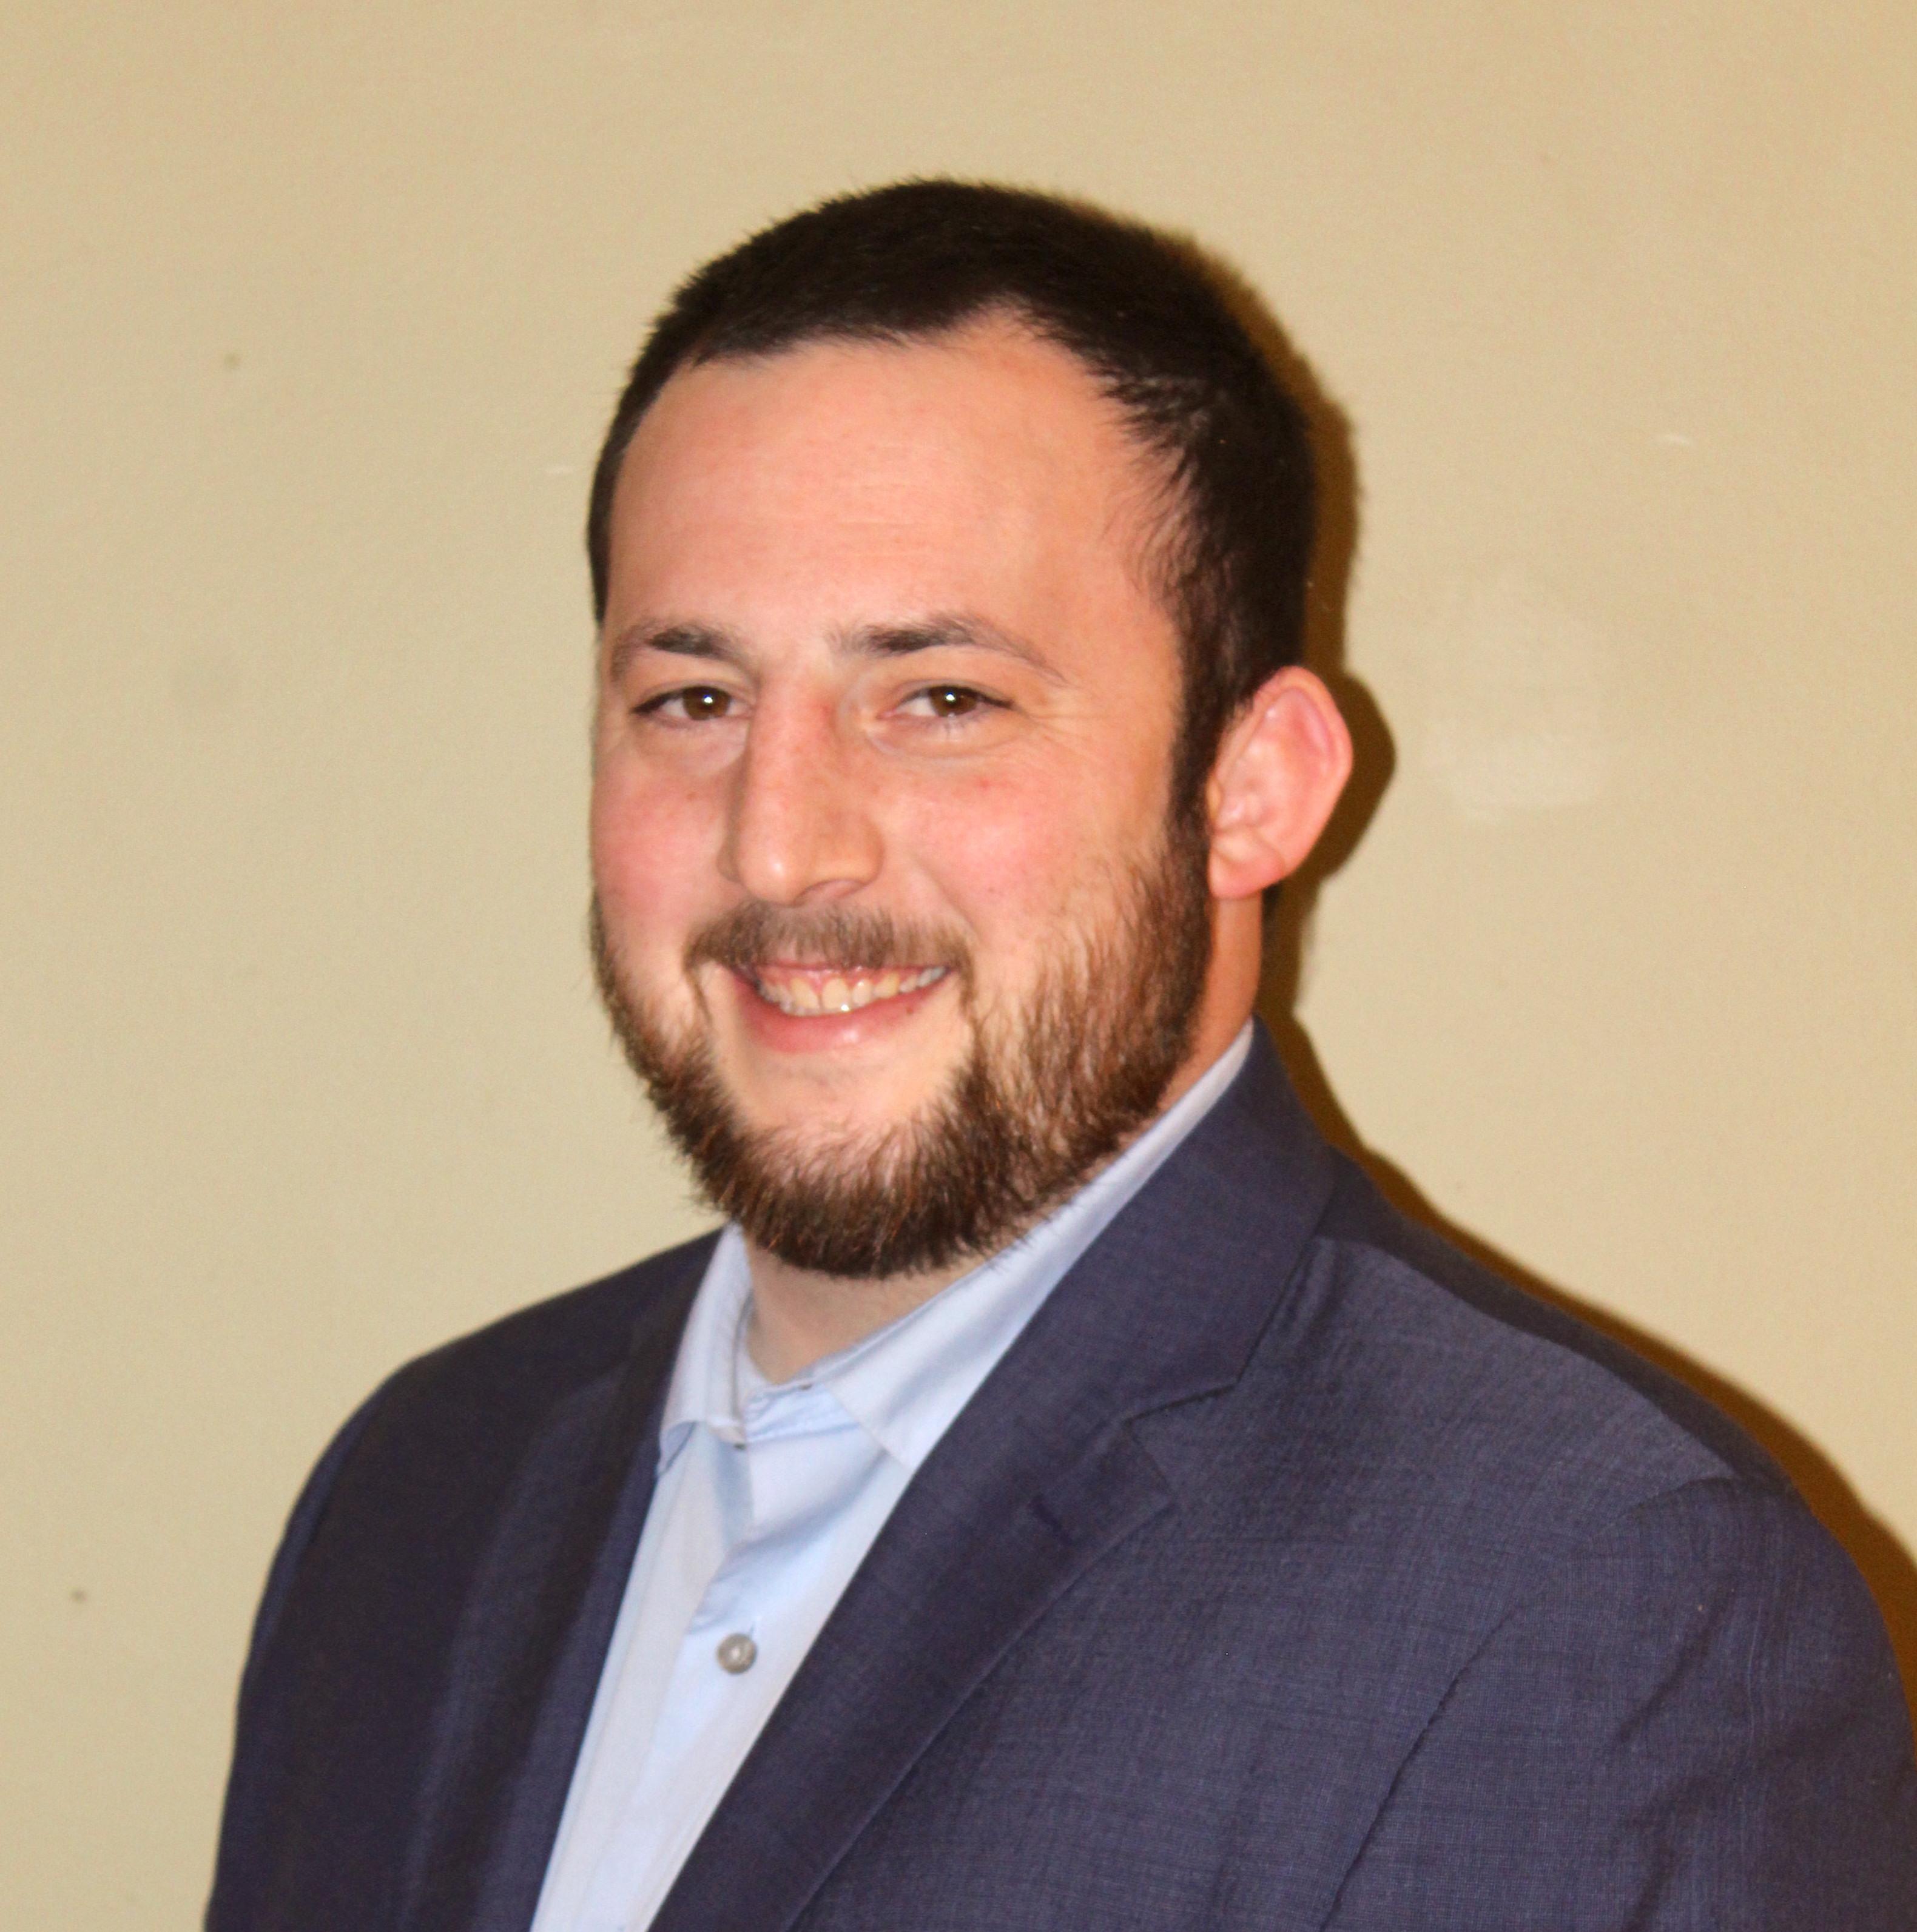 DOMINICK JAMES MAGOTEAUX Financial Professional & Insurance Agent